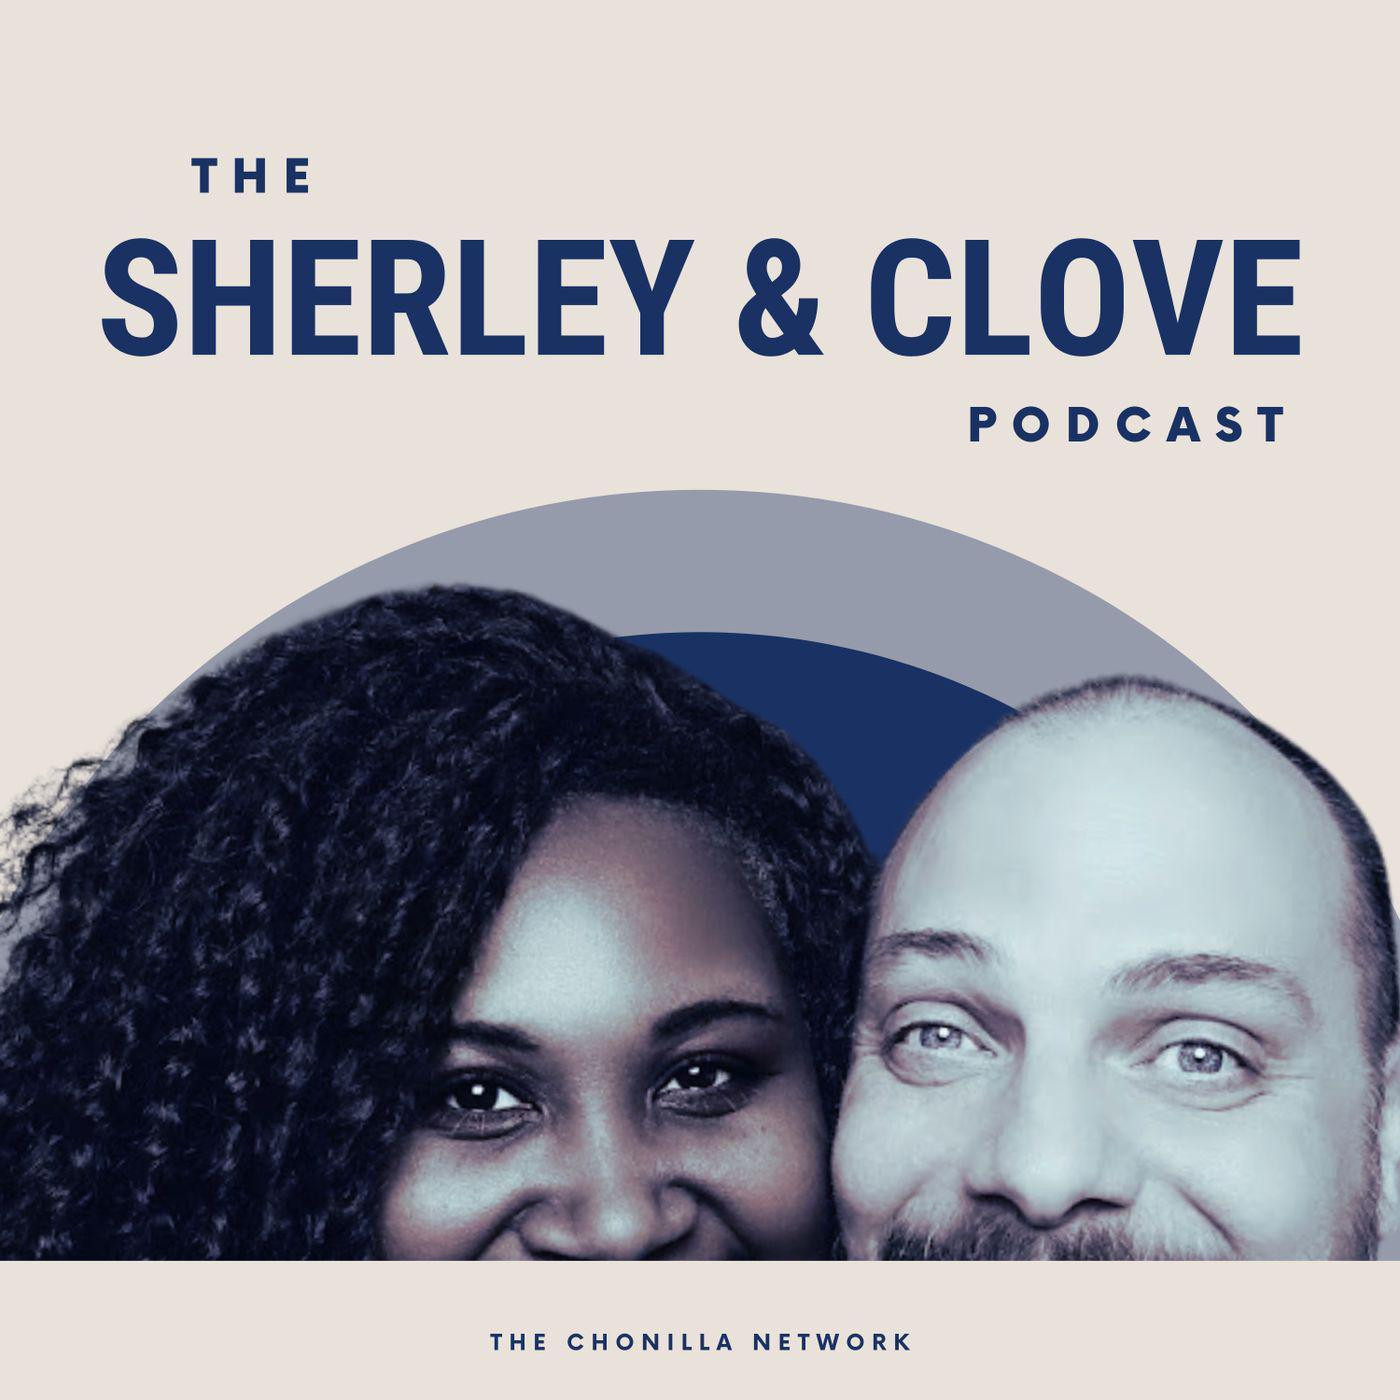 The Sherley & Clove Podcast